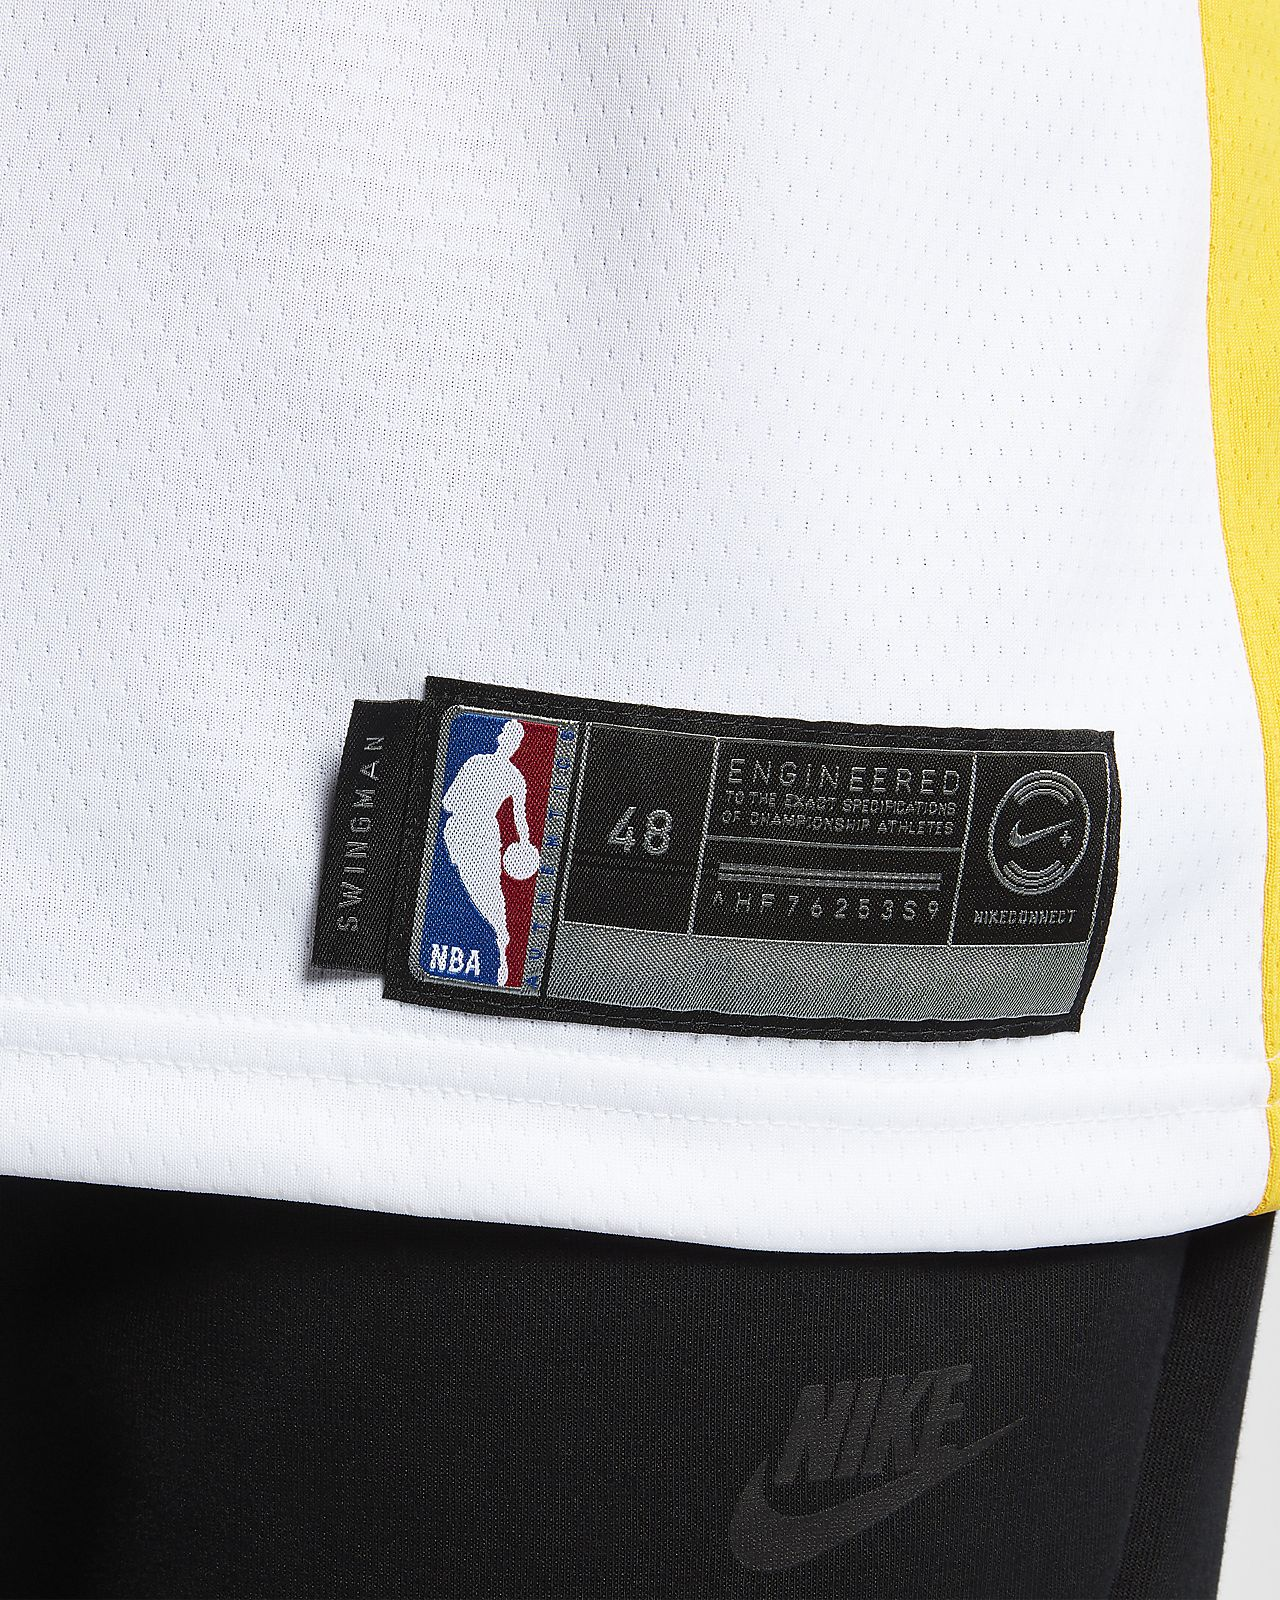 ... Stephen Curry Association Edition Swingman (Golden State Warriors)  Men s Nike NBA Connected Jersey 9adb07a2c